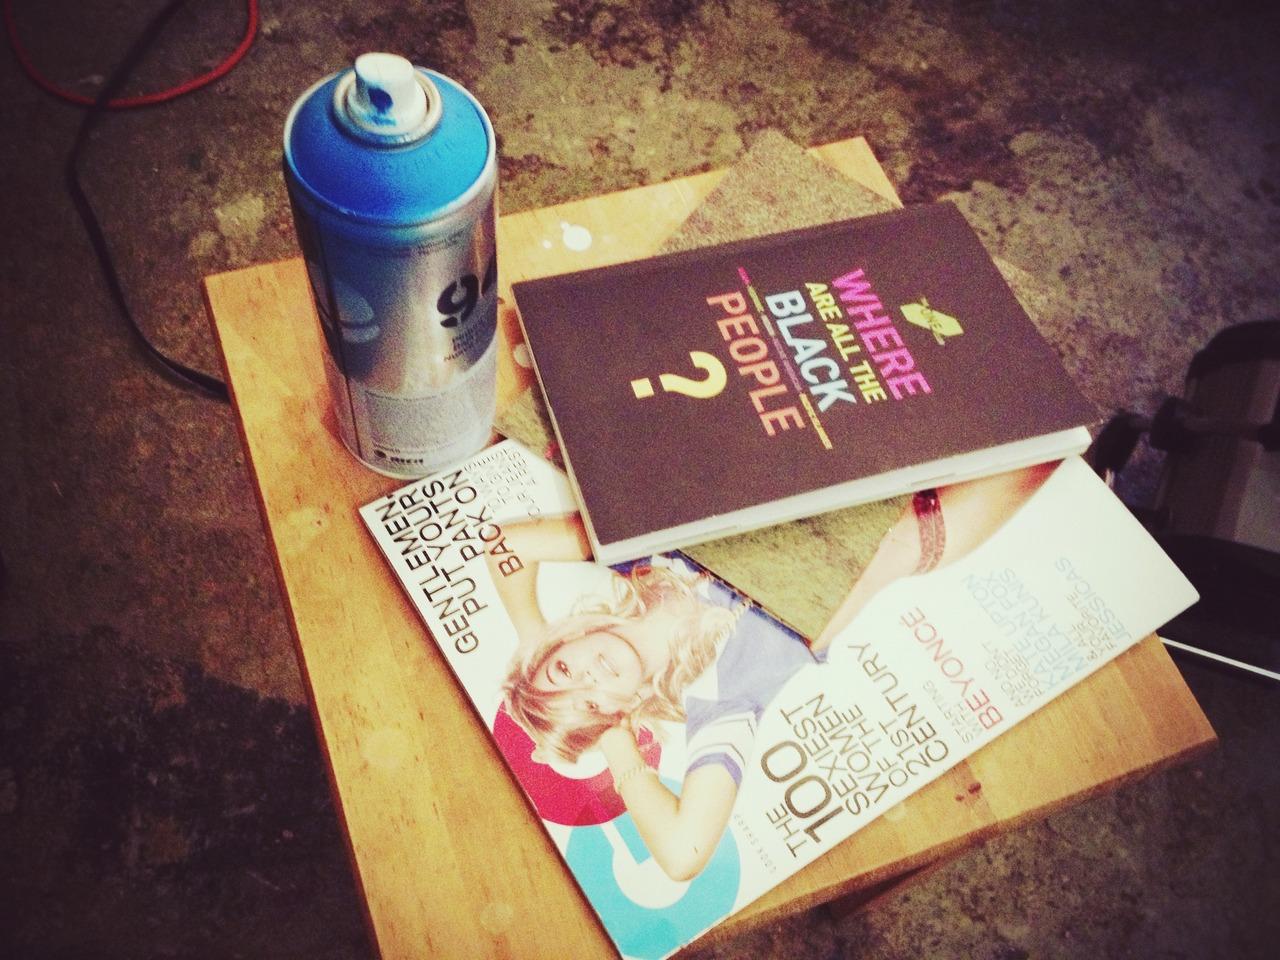 Studio Break - #pepper #peppersearching #gq #wherearetheblackpeople #spaycan #graffiti